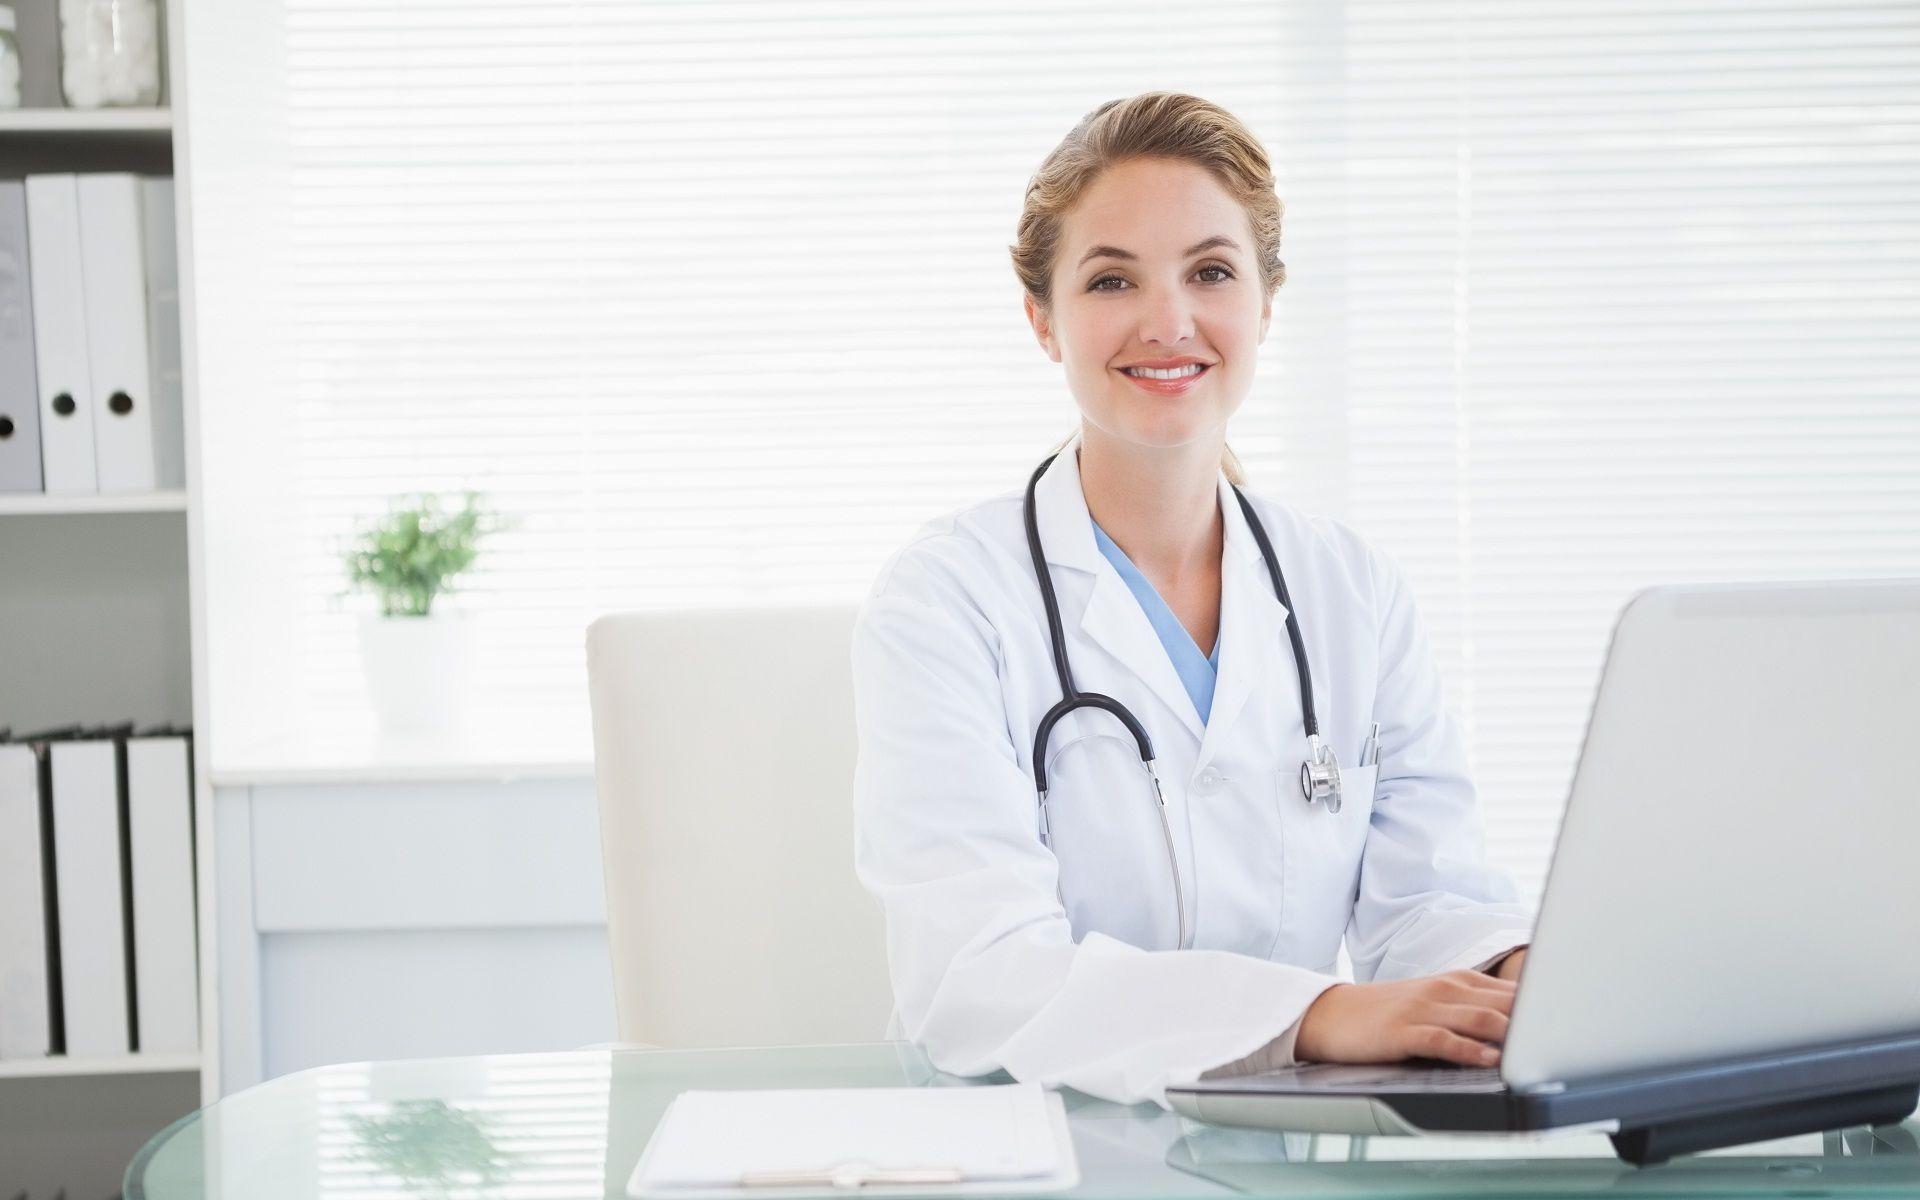 Hd Doctors